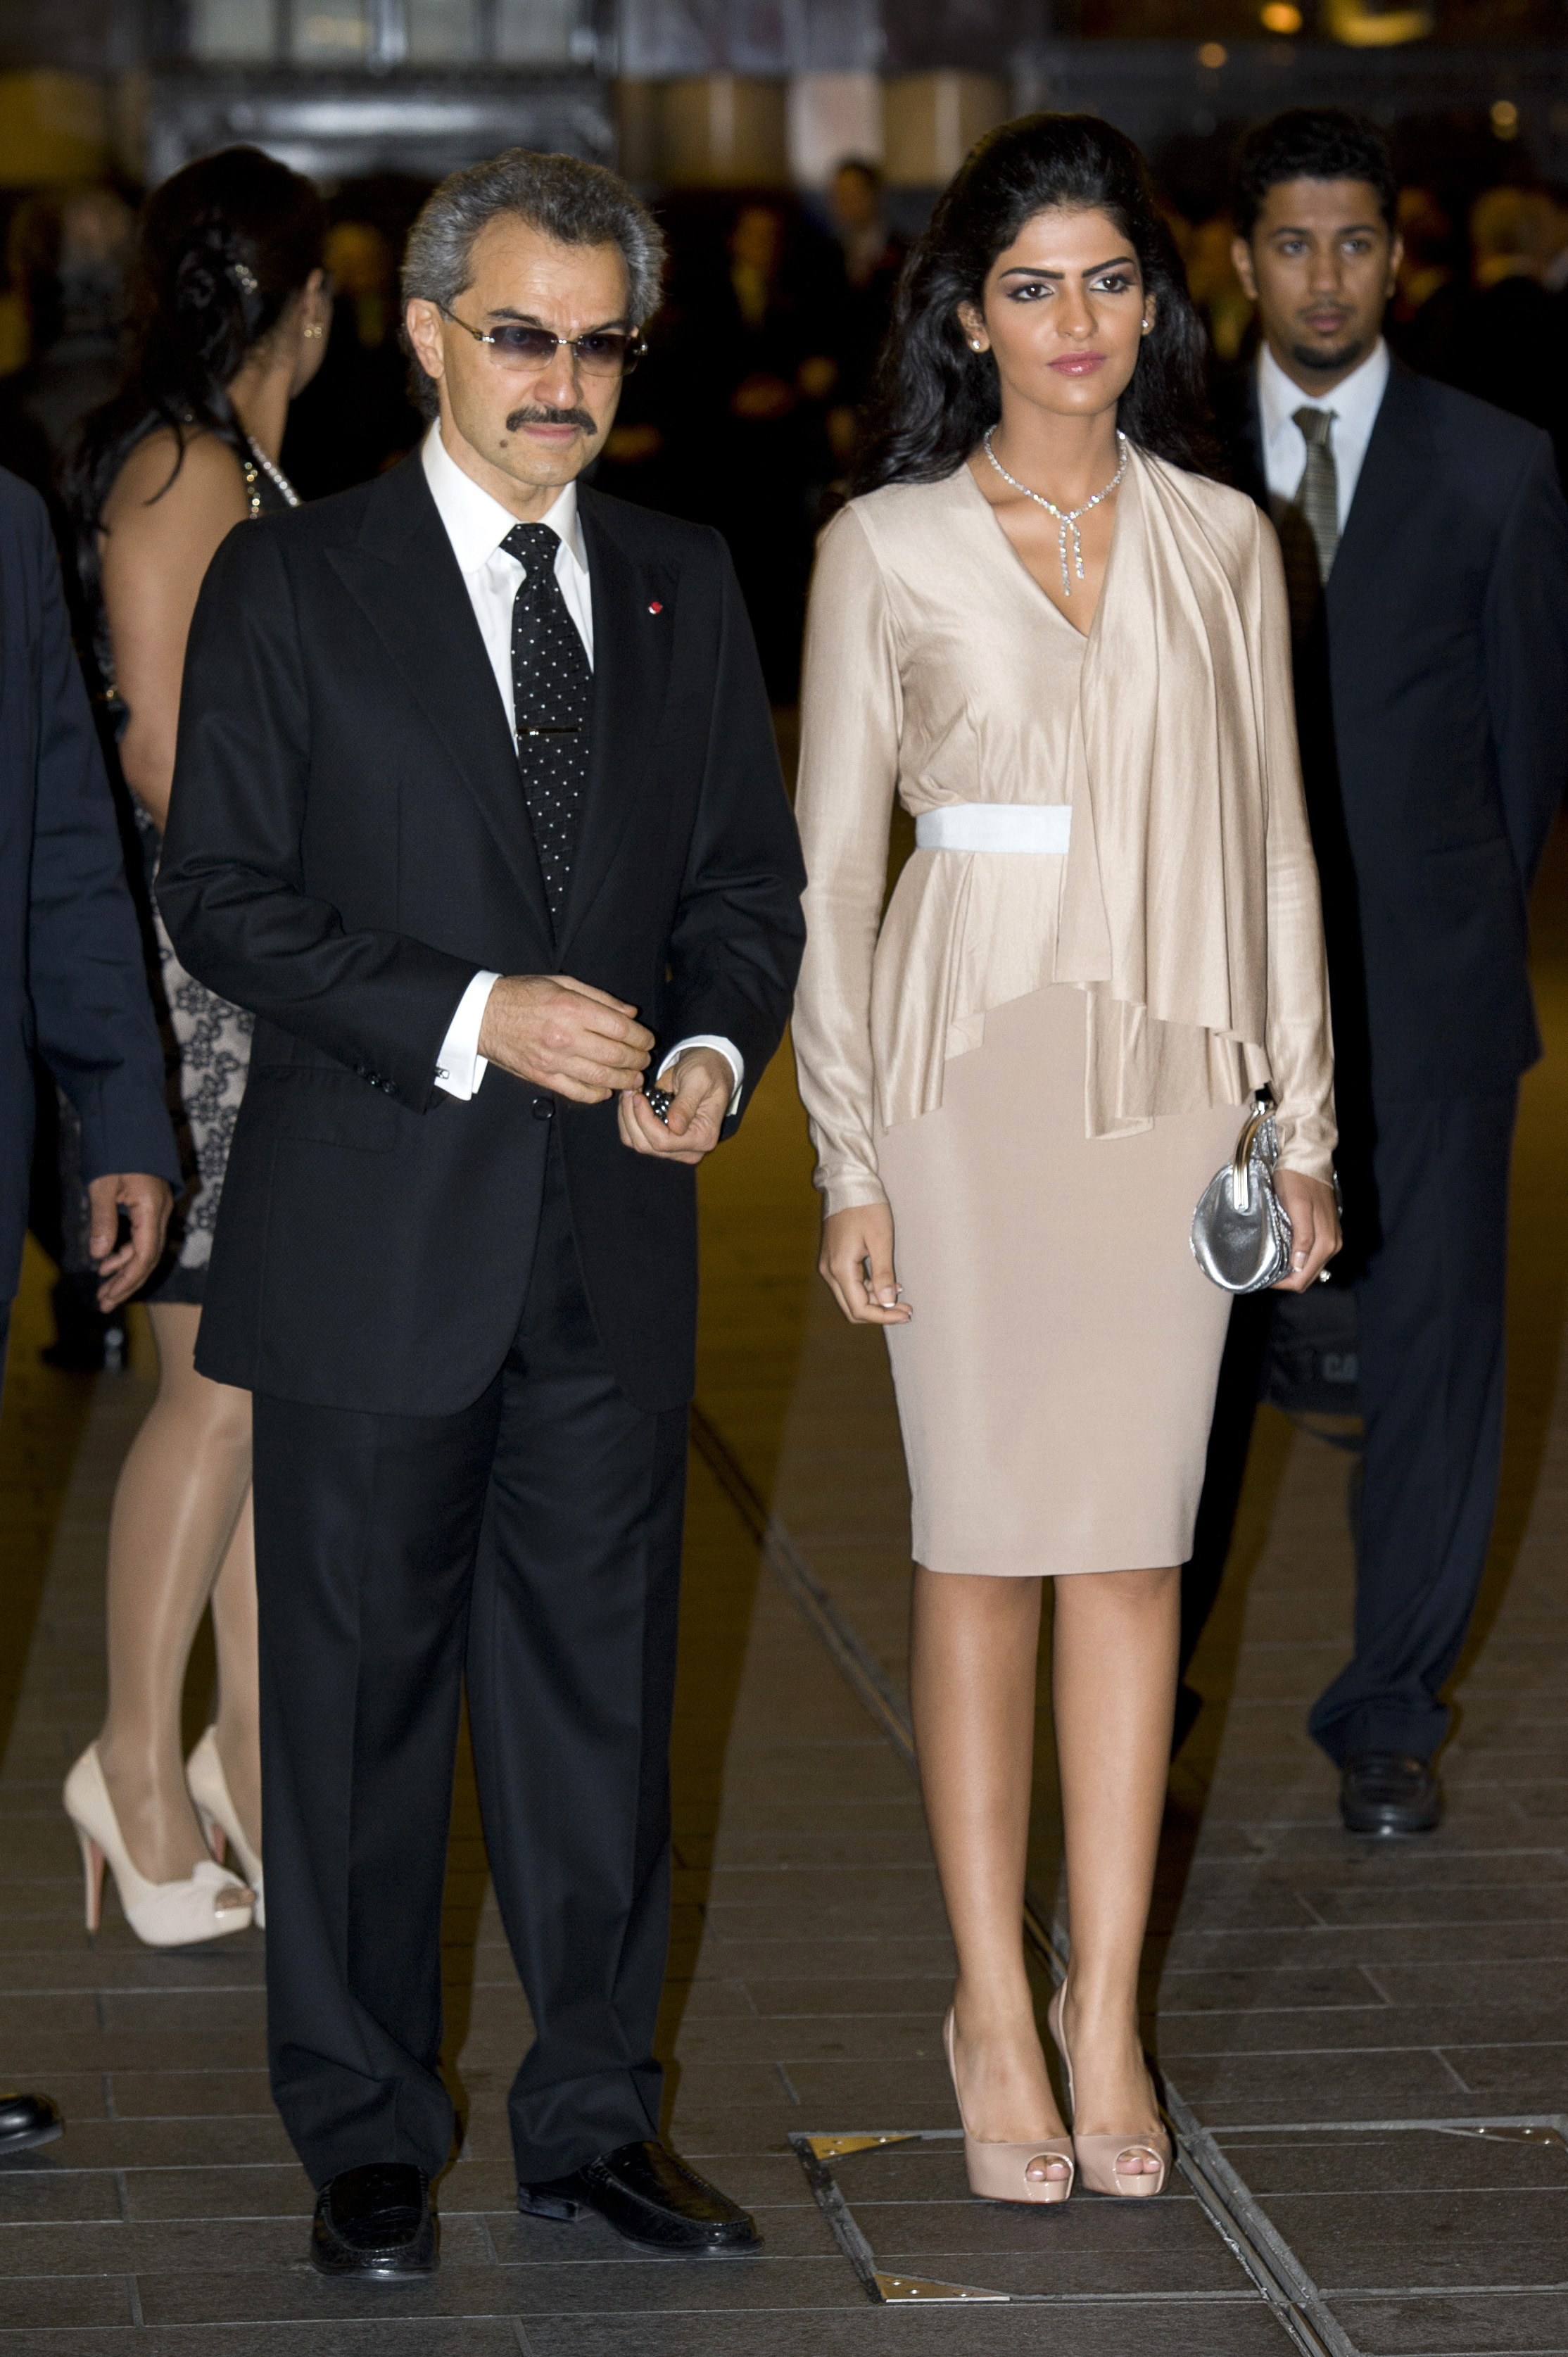 Saudi Prince Al-Waleed Bin Talal, a Shareholder in Fox, Announces Plans to Boost Arab Film Industry